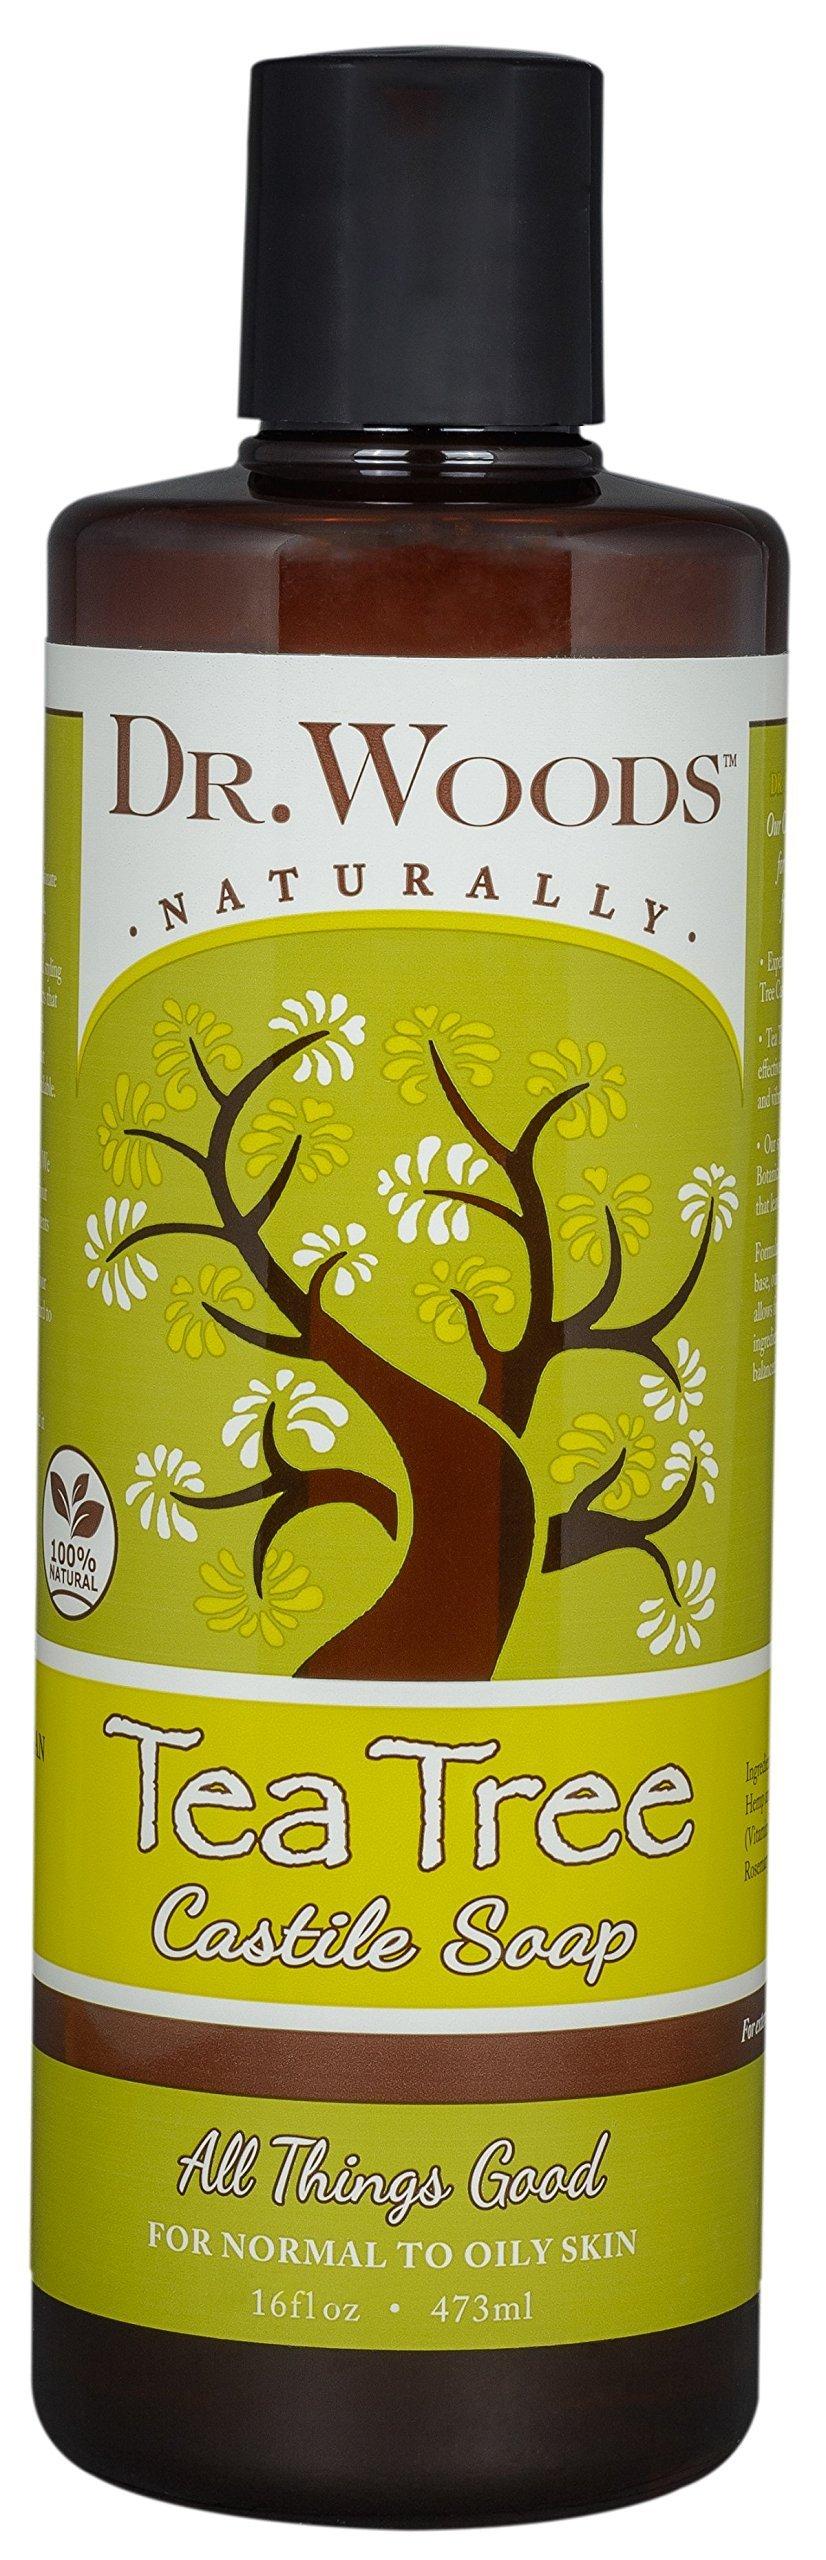 Dr. Woods Pure Castile Soap Tea Tree, 16 Ounce